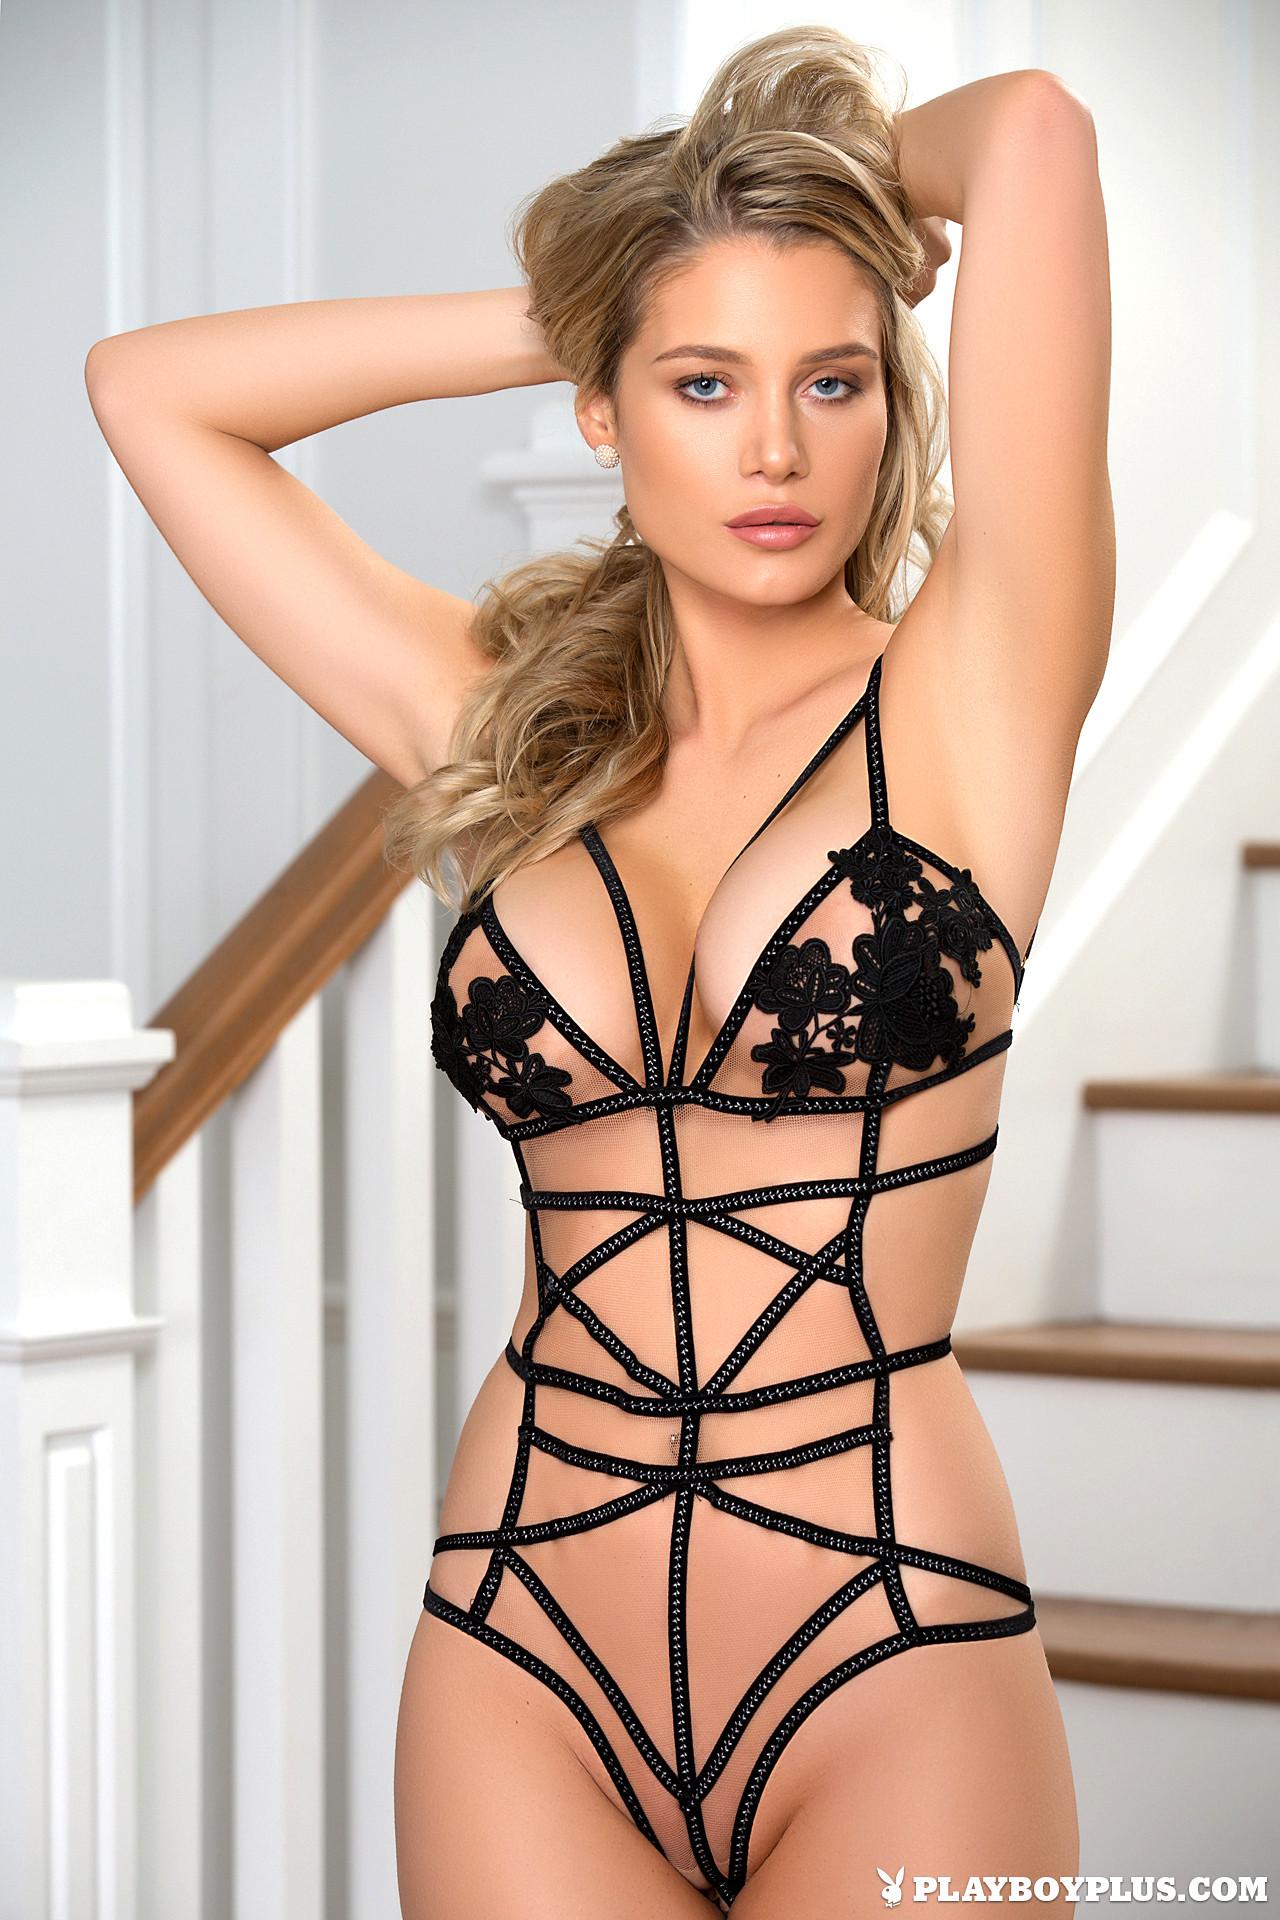 Babe Today Playboy Plus Anna Opsal Unlocked Scandinavian -1280